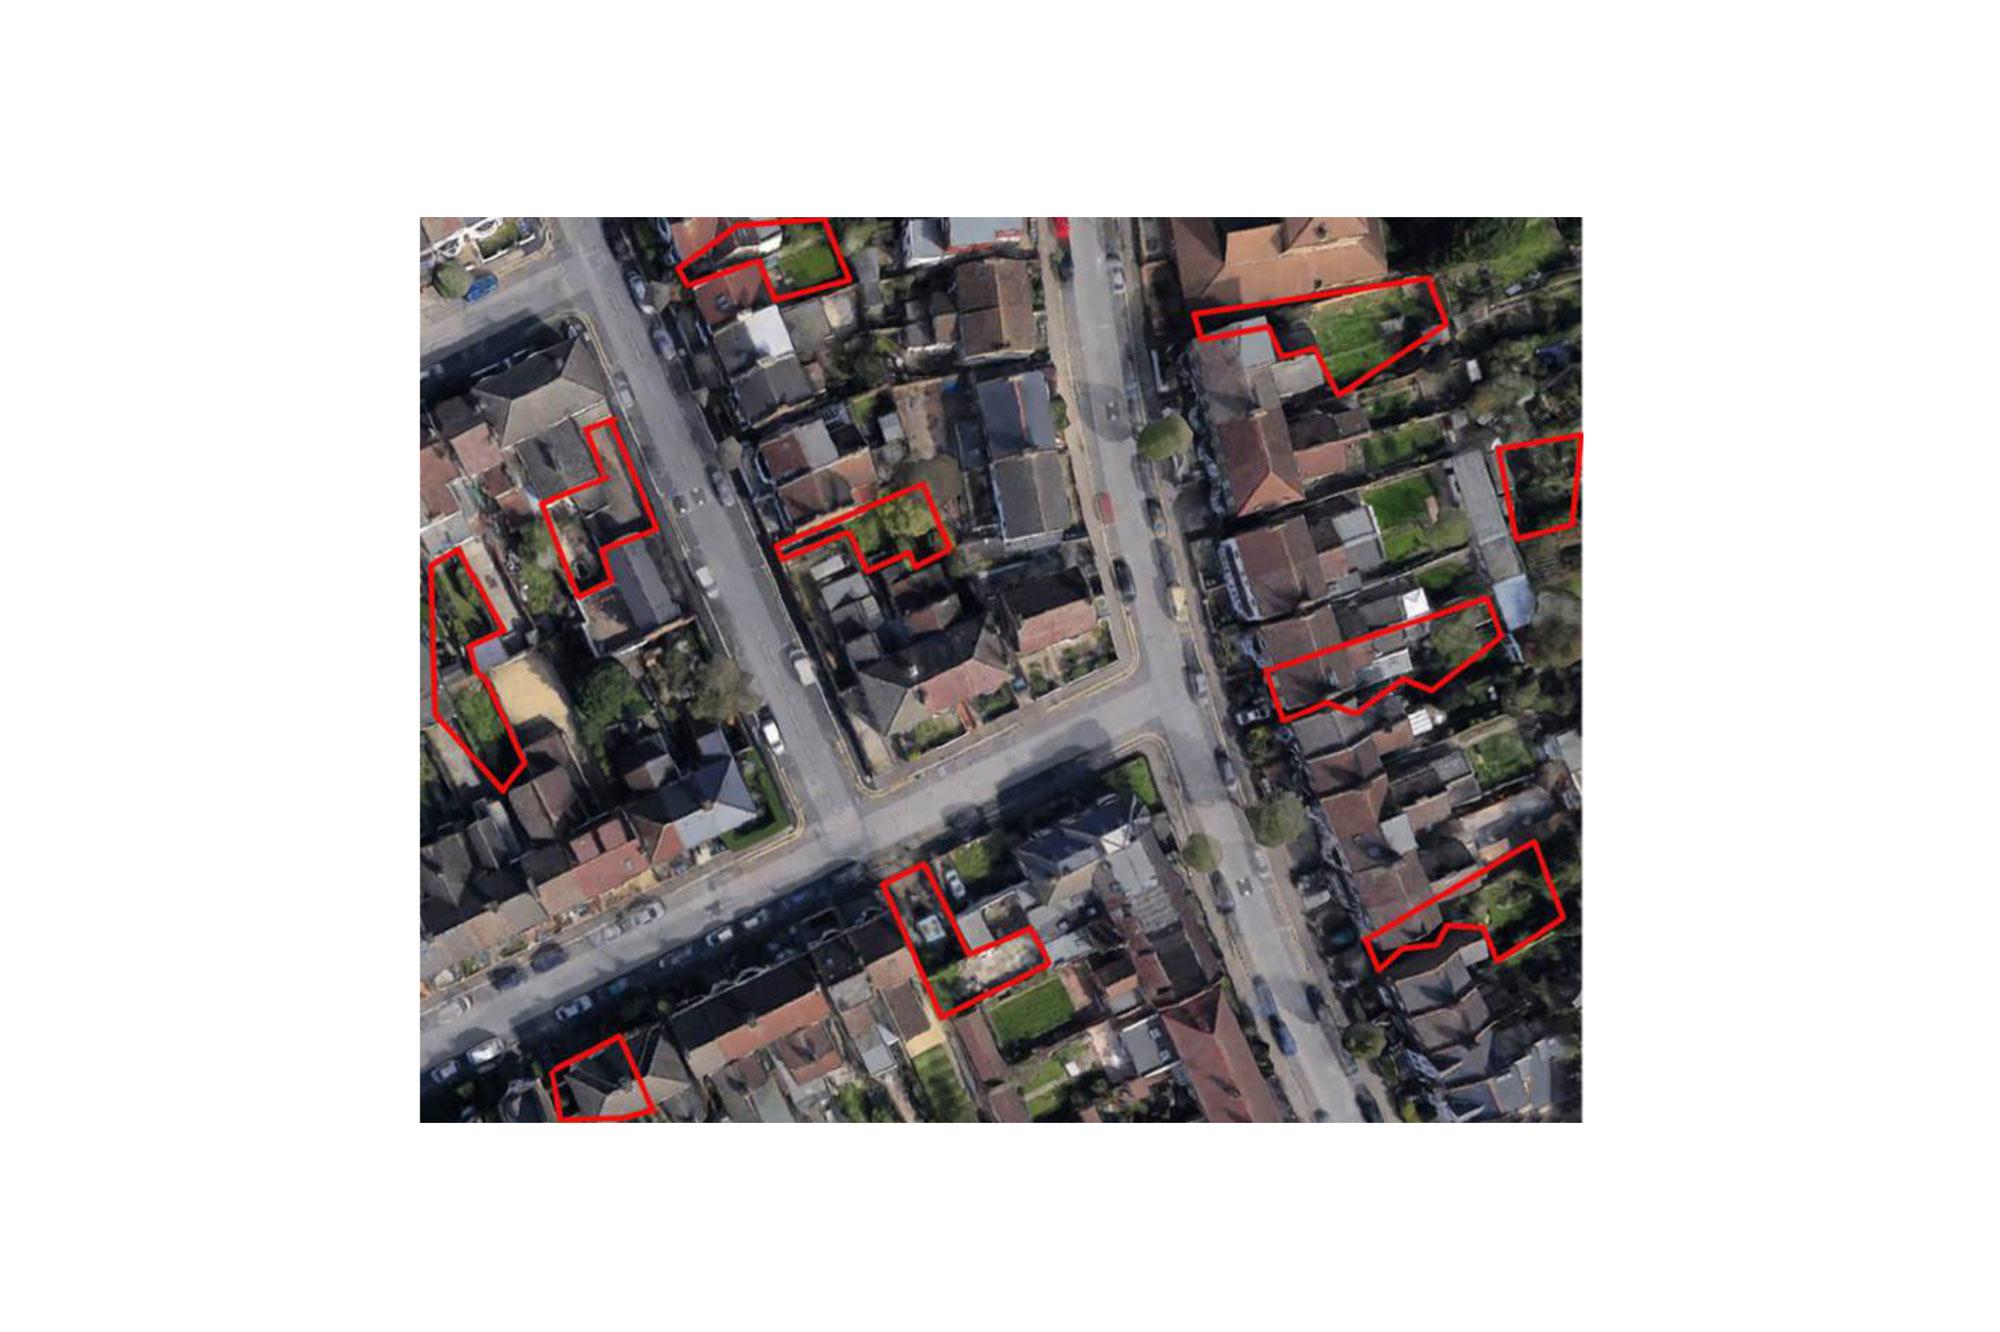 cube-haus-skene-catling-architects-cs-2000×1332-11